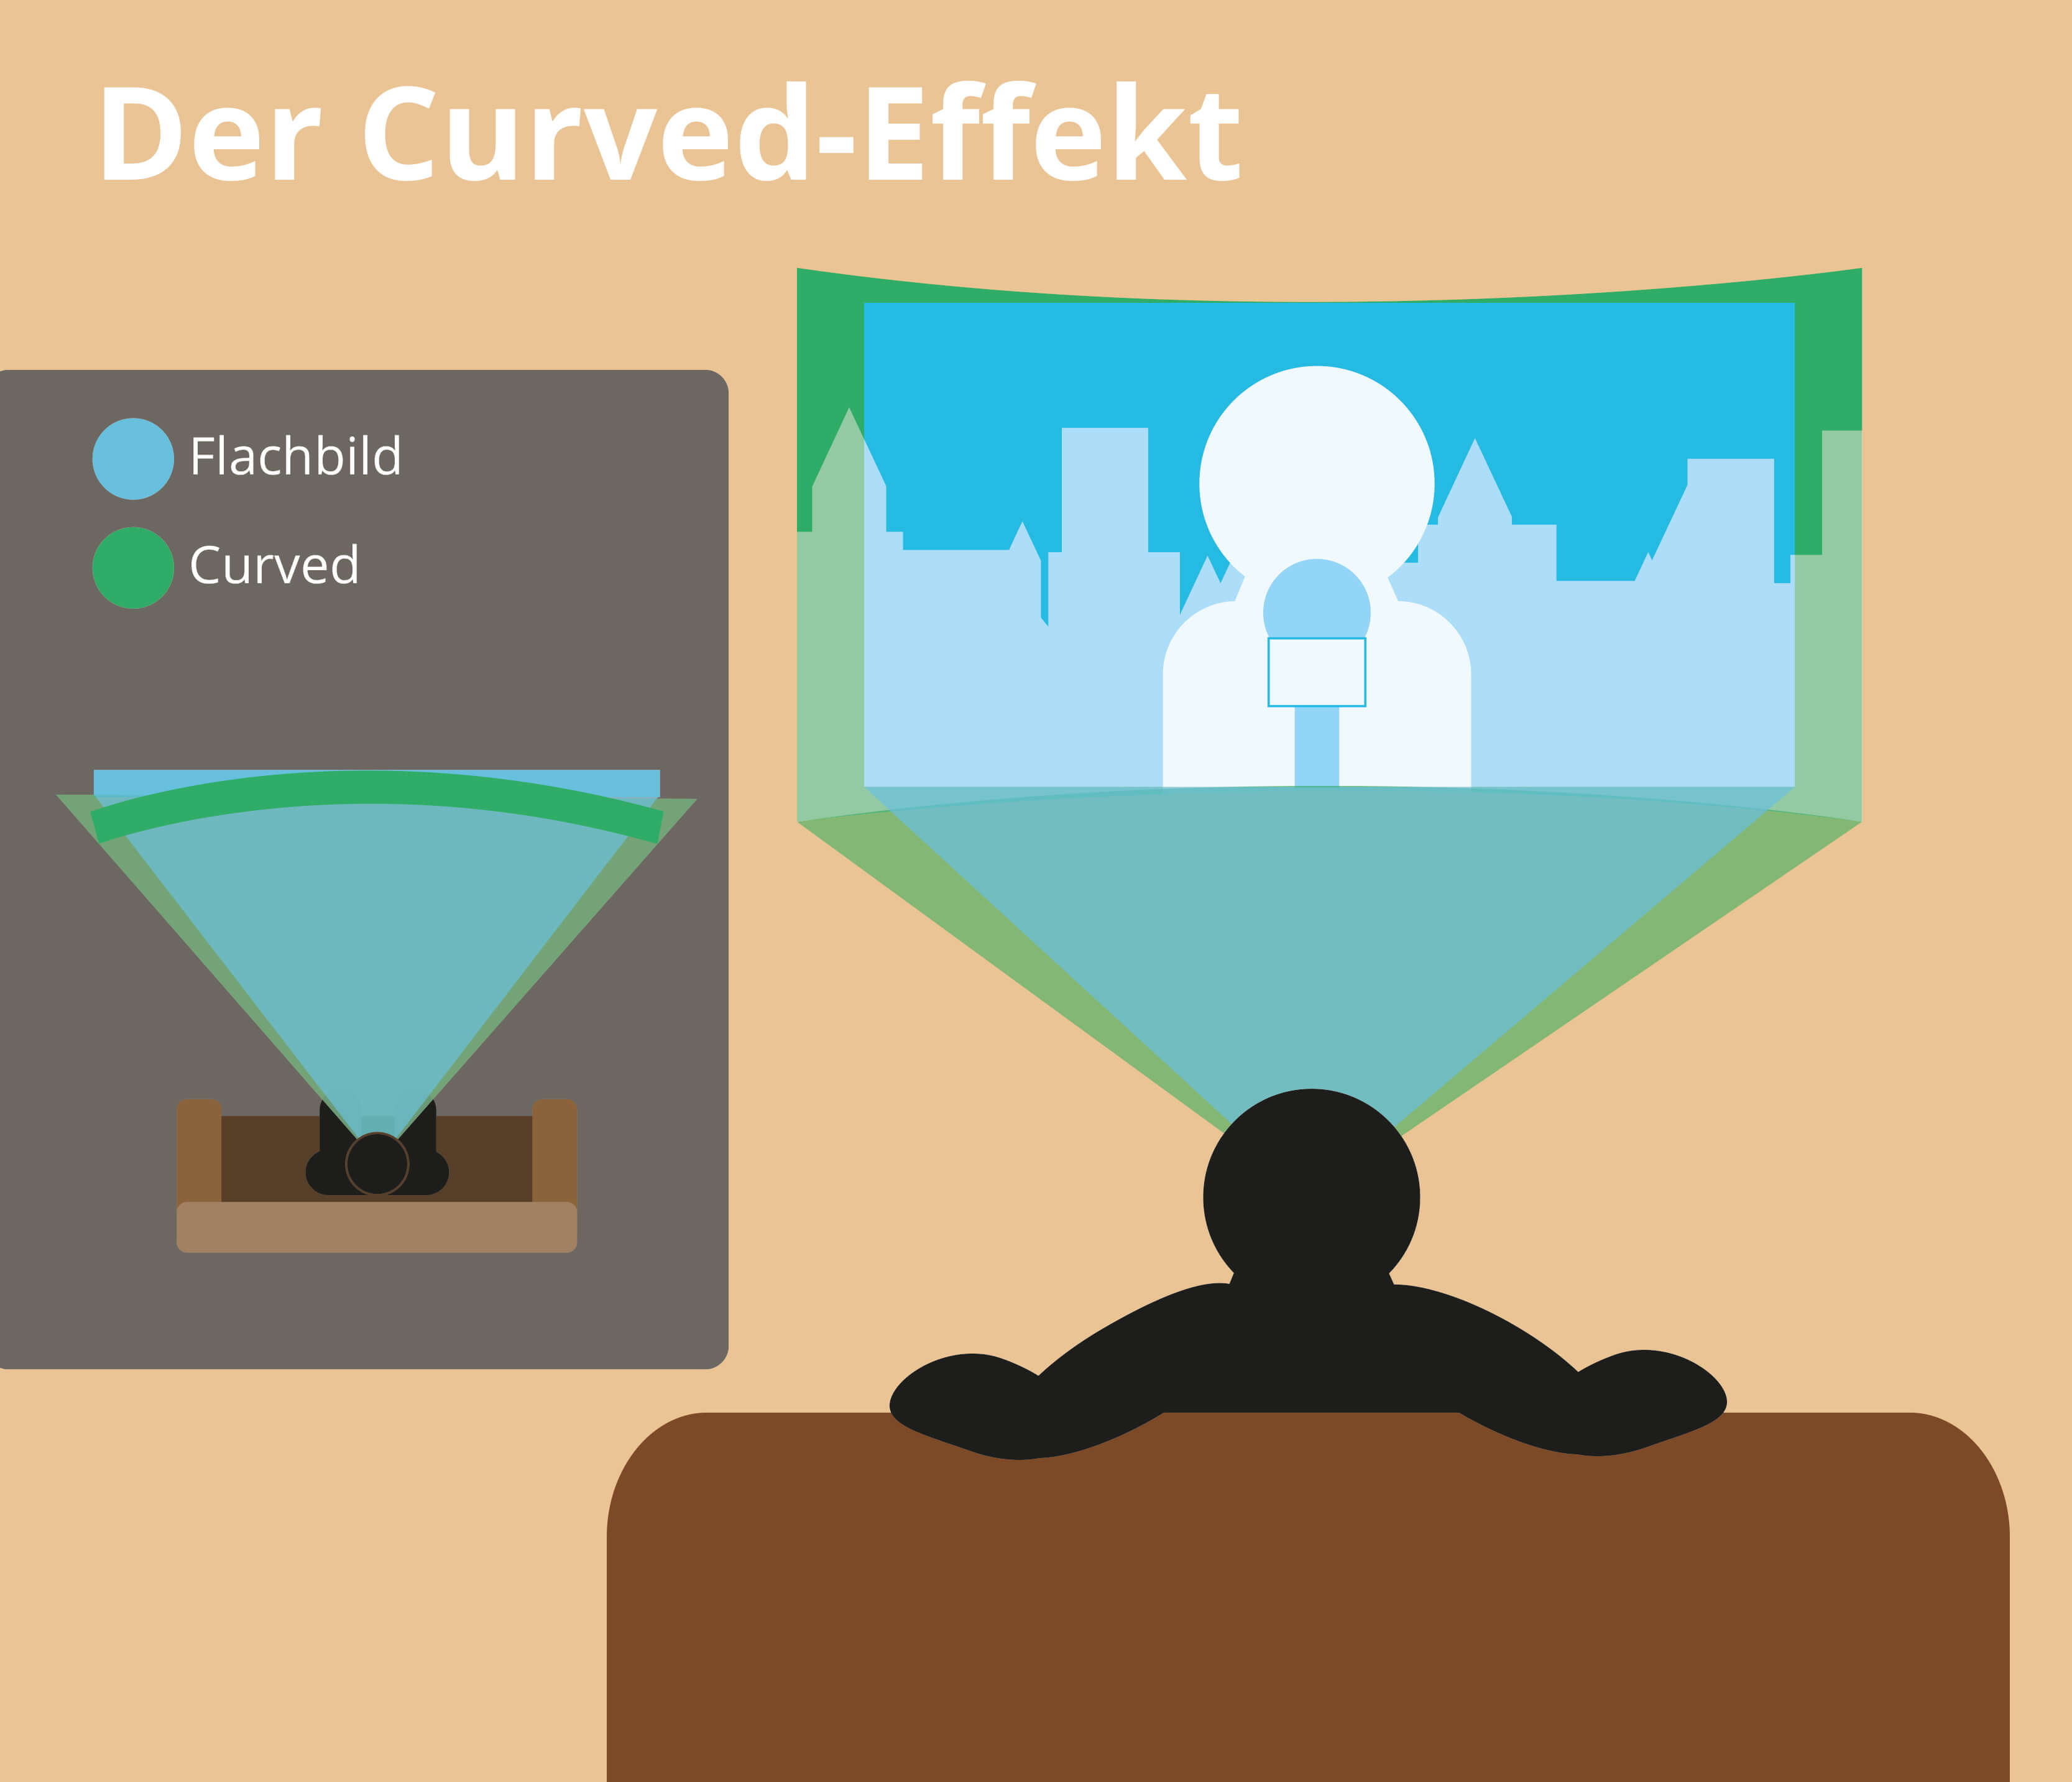 Der Curved-Effekt